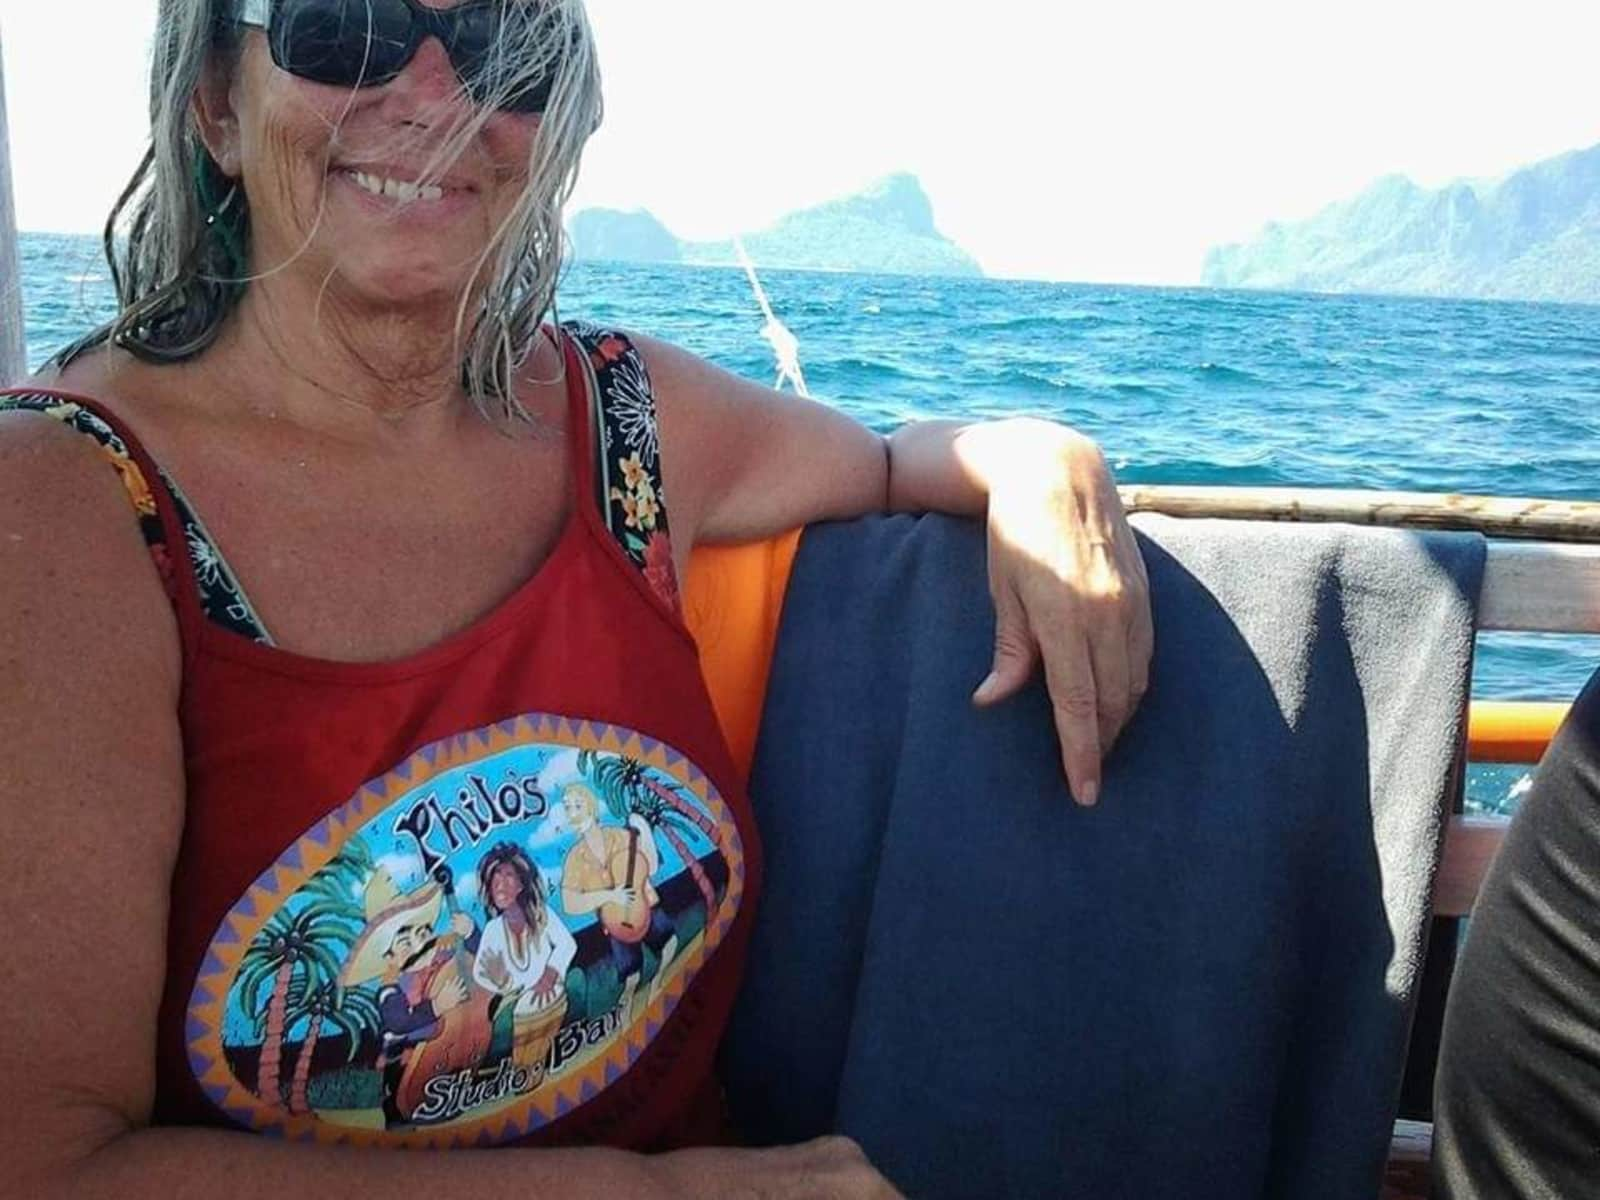 Lynda from Summerland, British Columbia, Canada